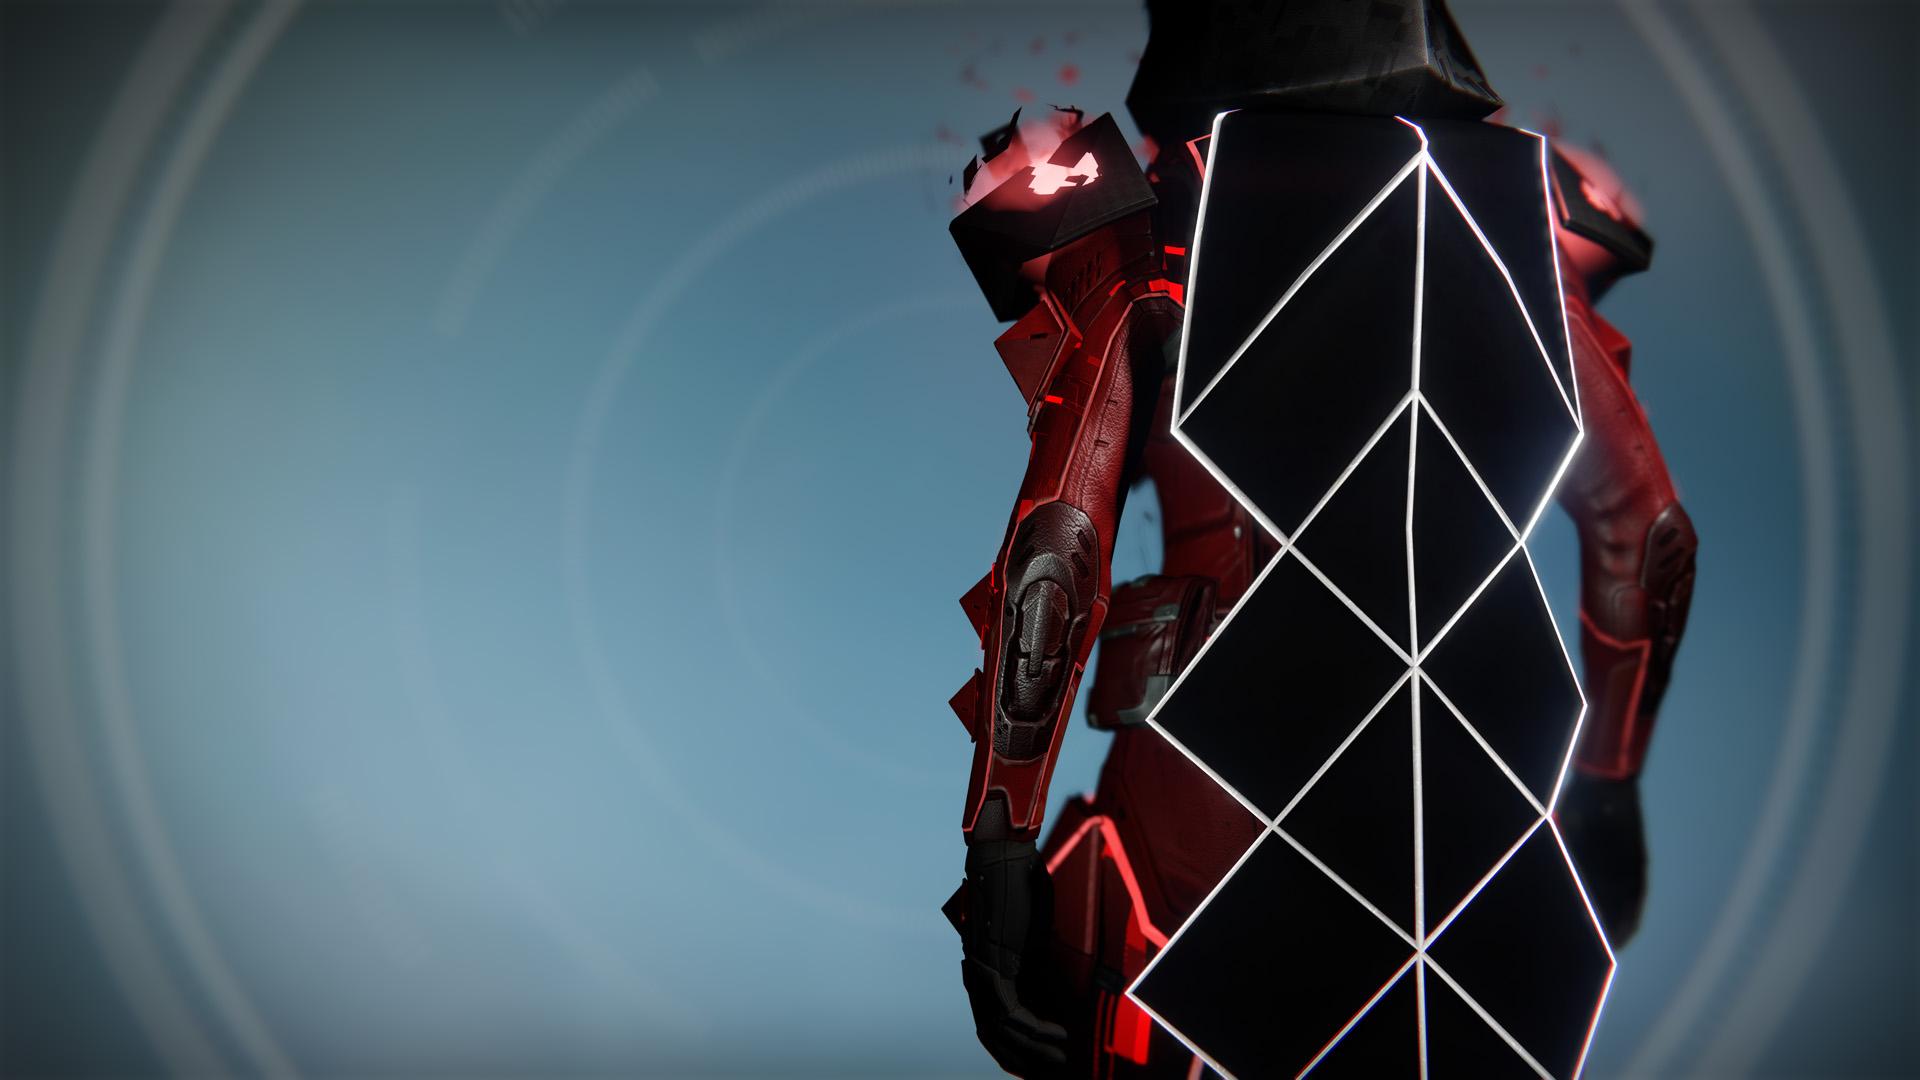 Destiny_age_of_triumph_hunter_wrath_of_the_machine_skin 5